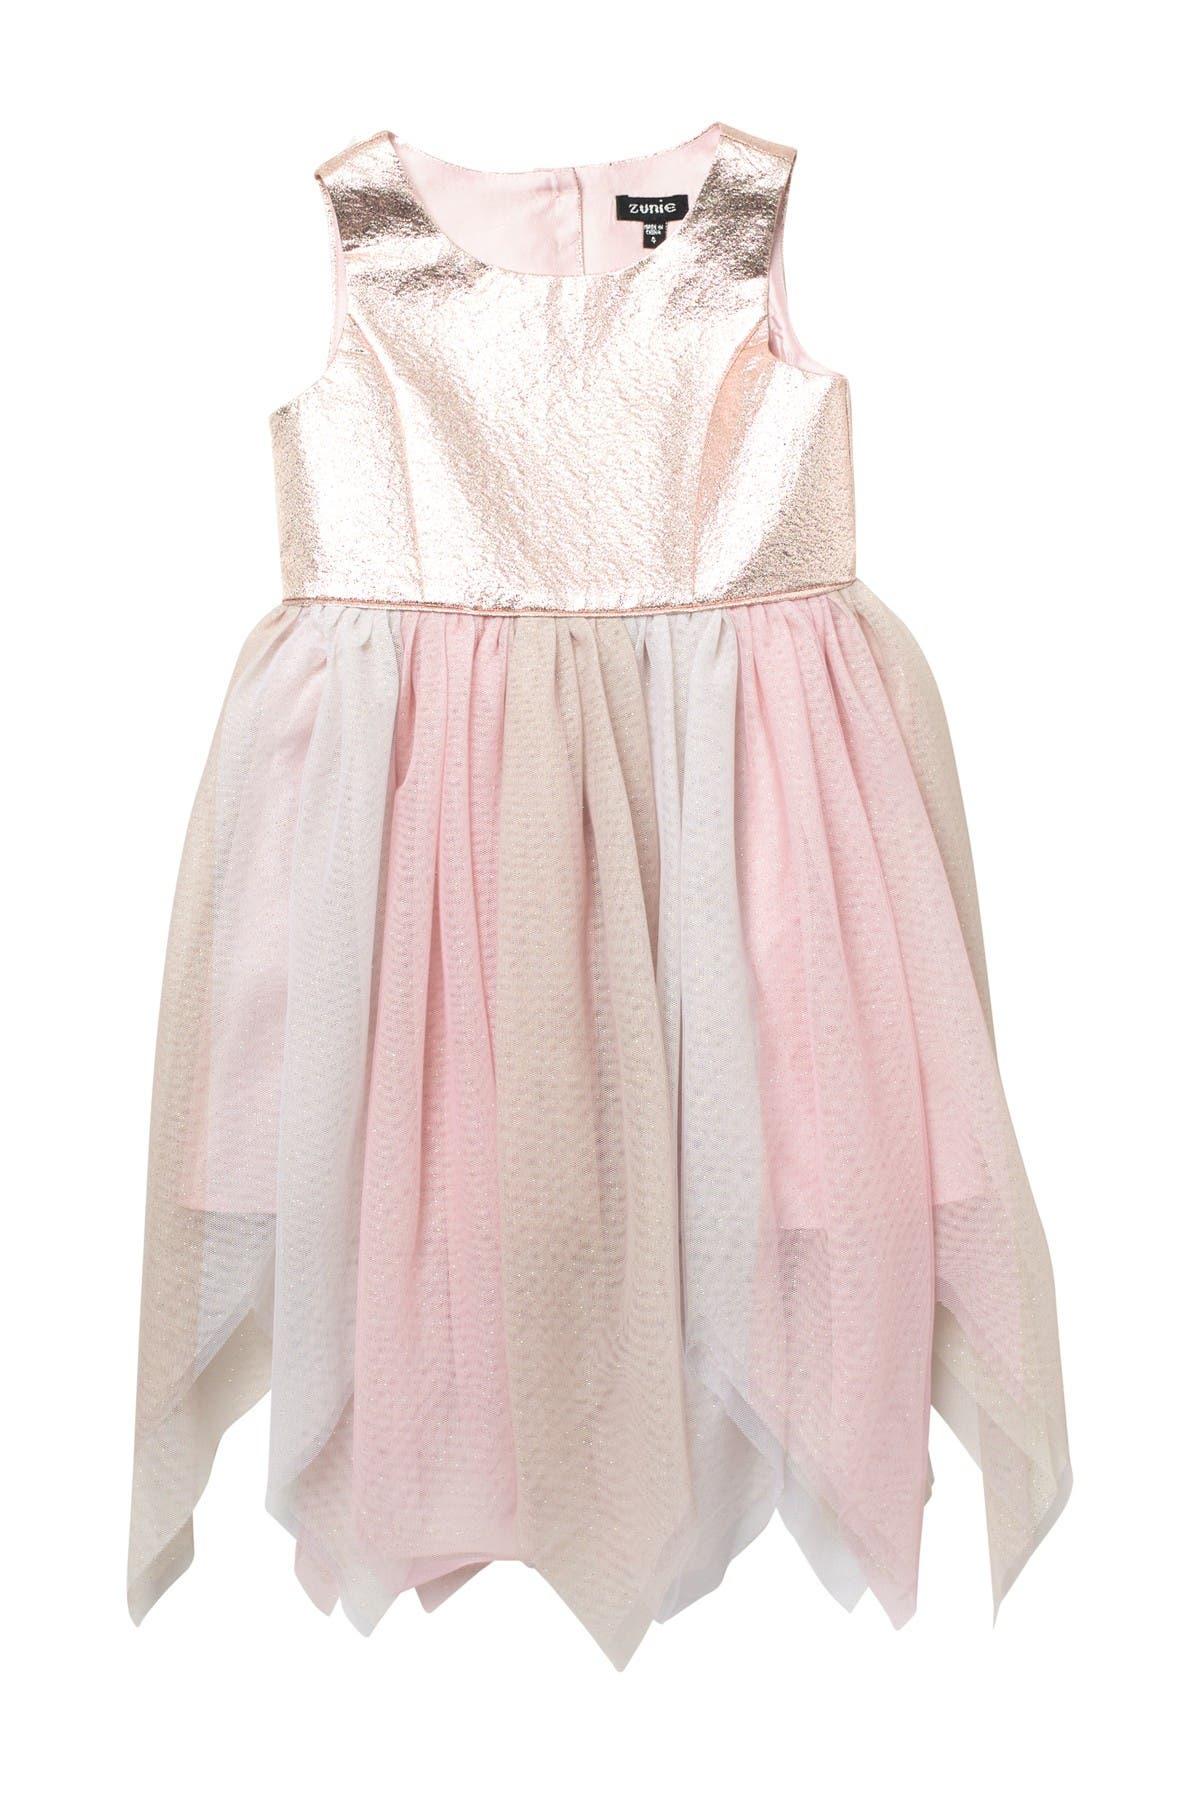 Image of Zunie Sleeveless Brocade Mesh Fairy Dress